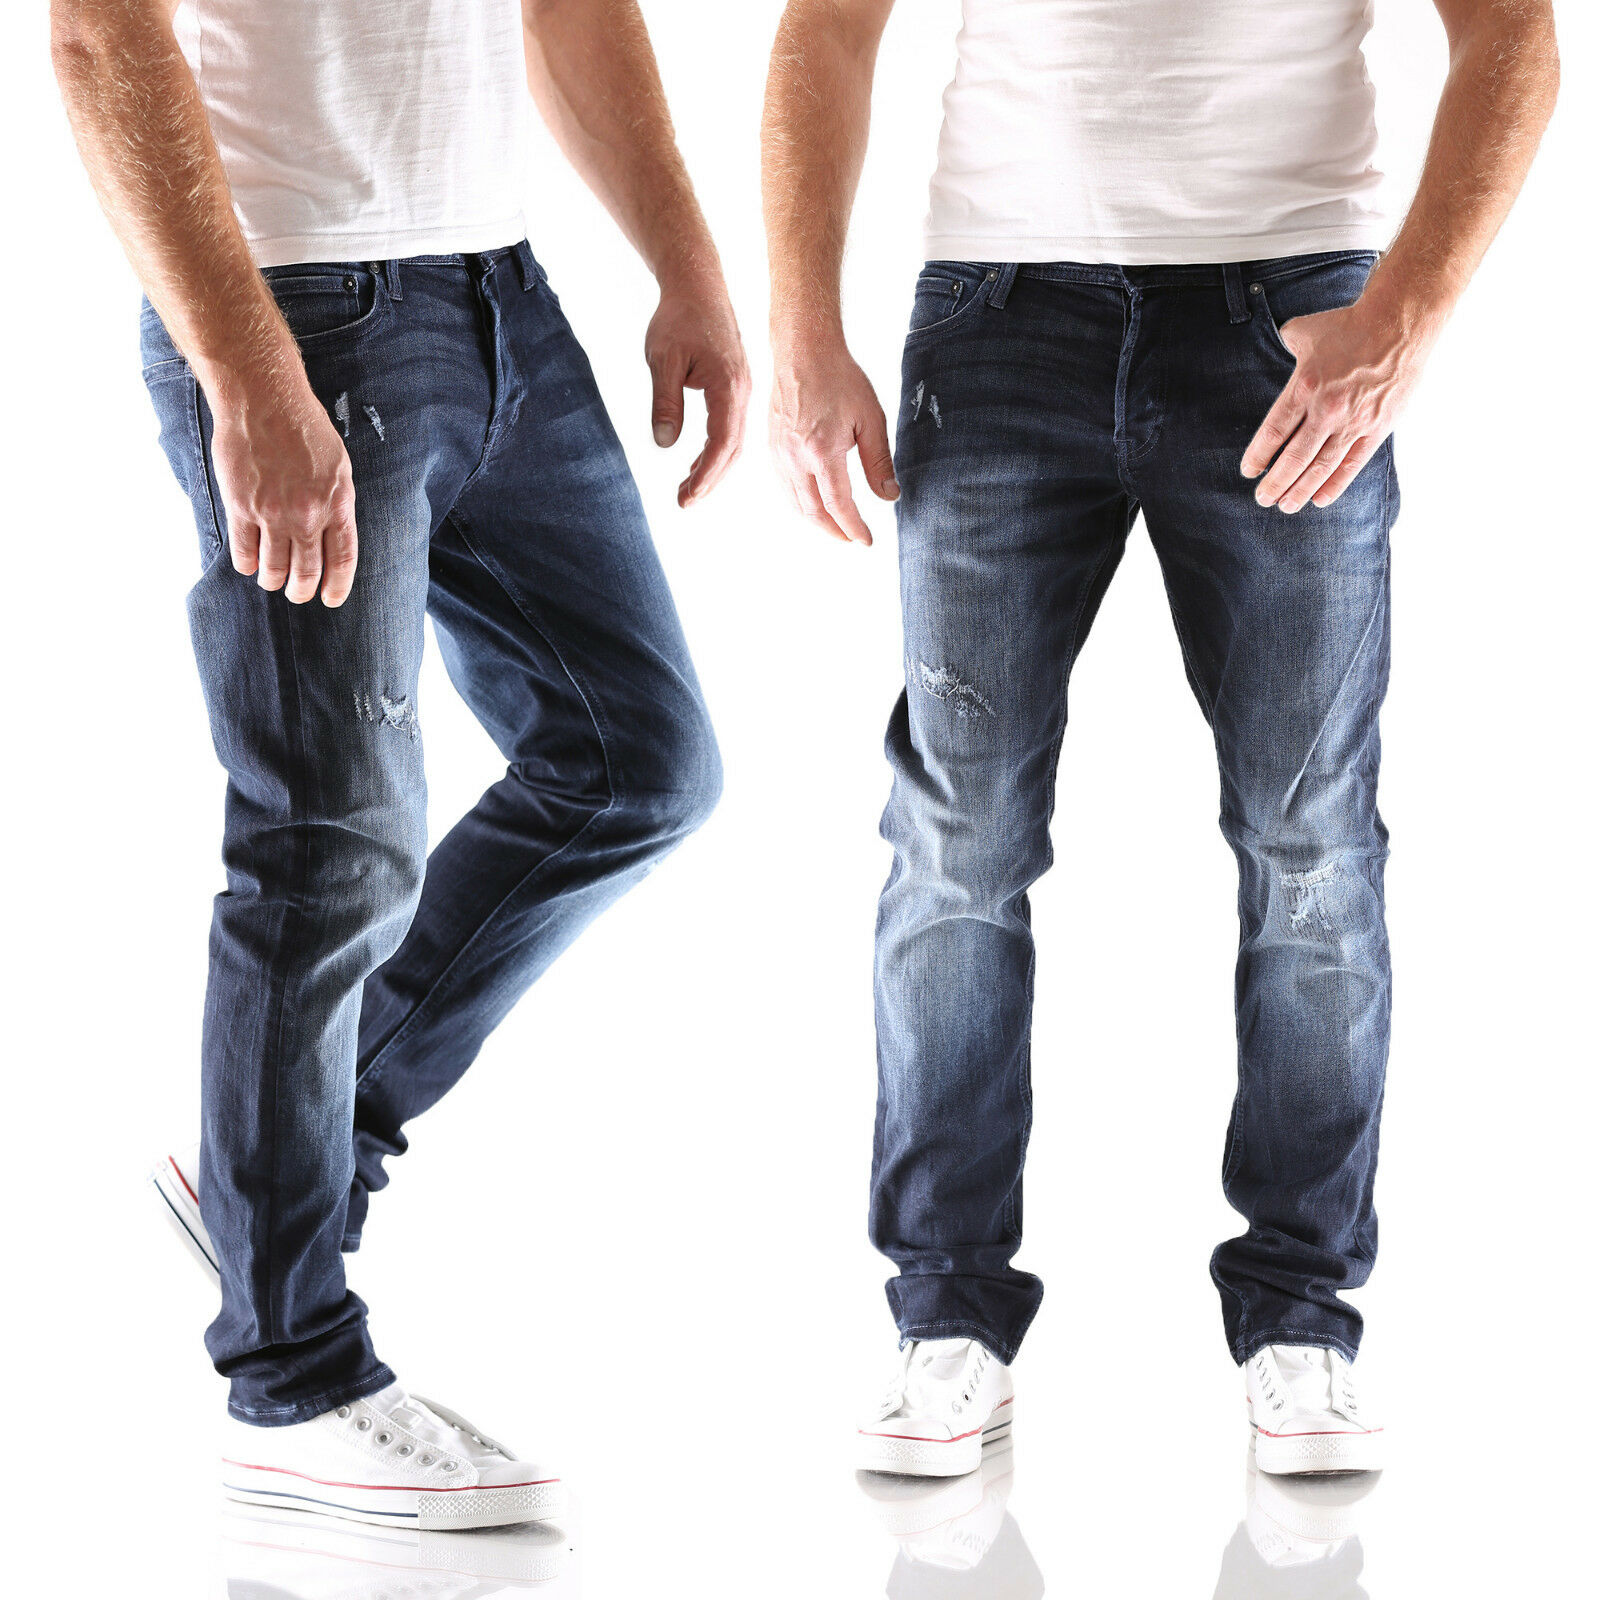 Jack & Jones Glenn ORIGINALE GE 149 Slim Fit Jeans Uomo Pantaloni Nuovo